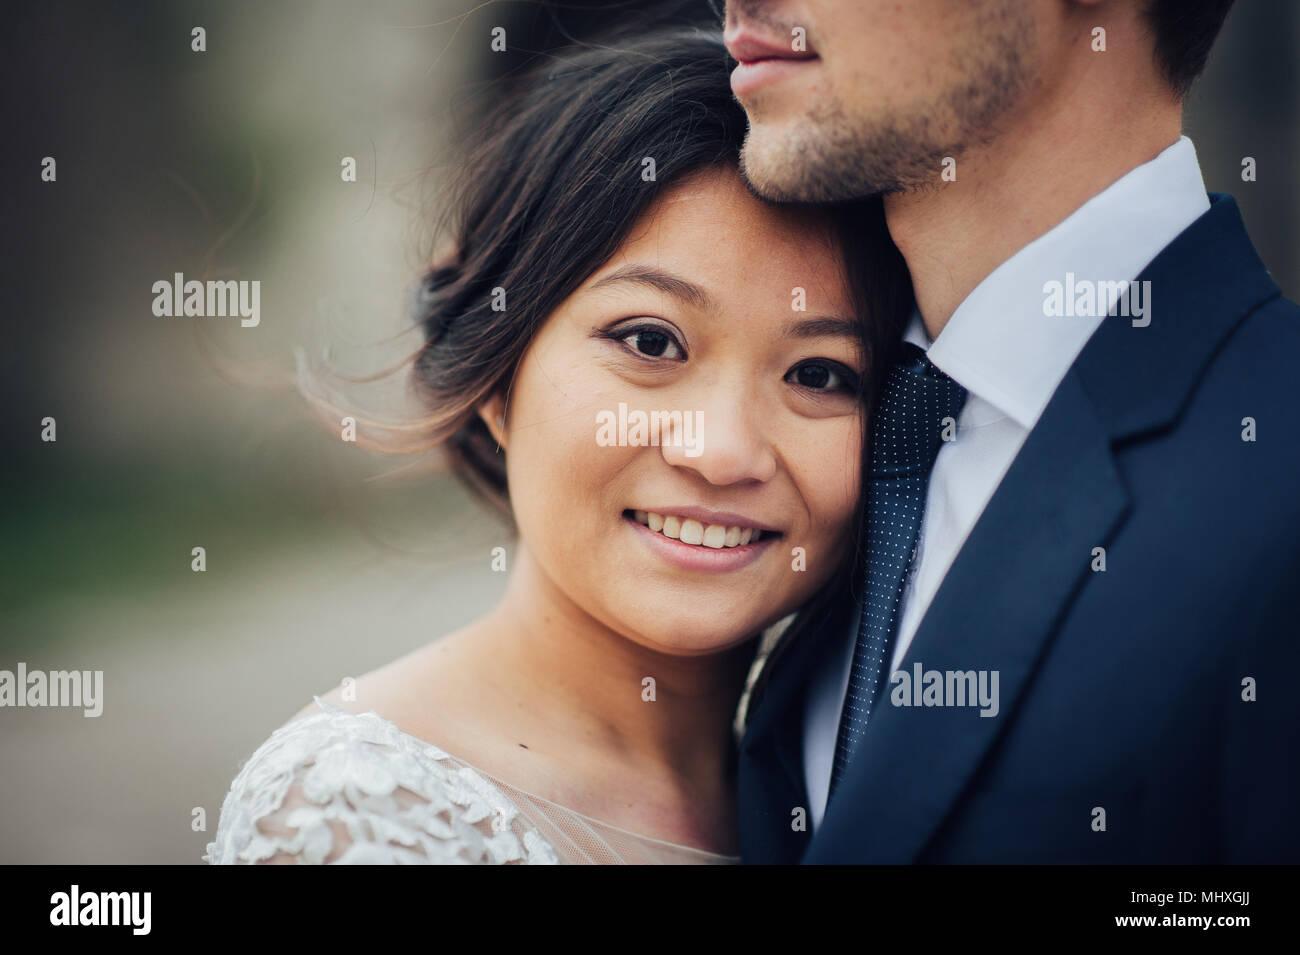 Asiatische Dating-Braut